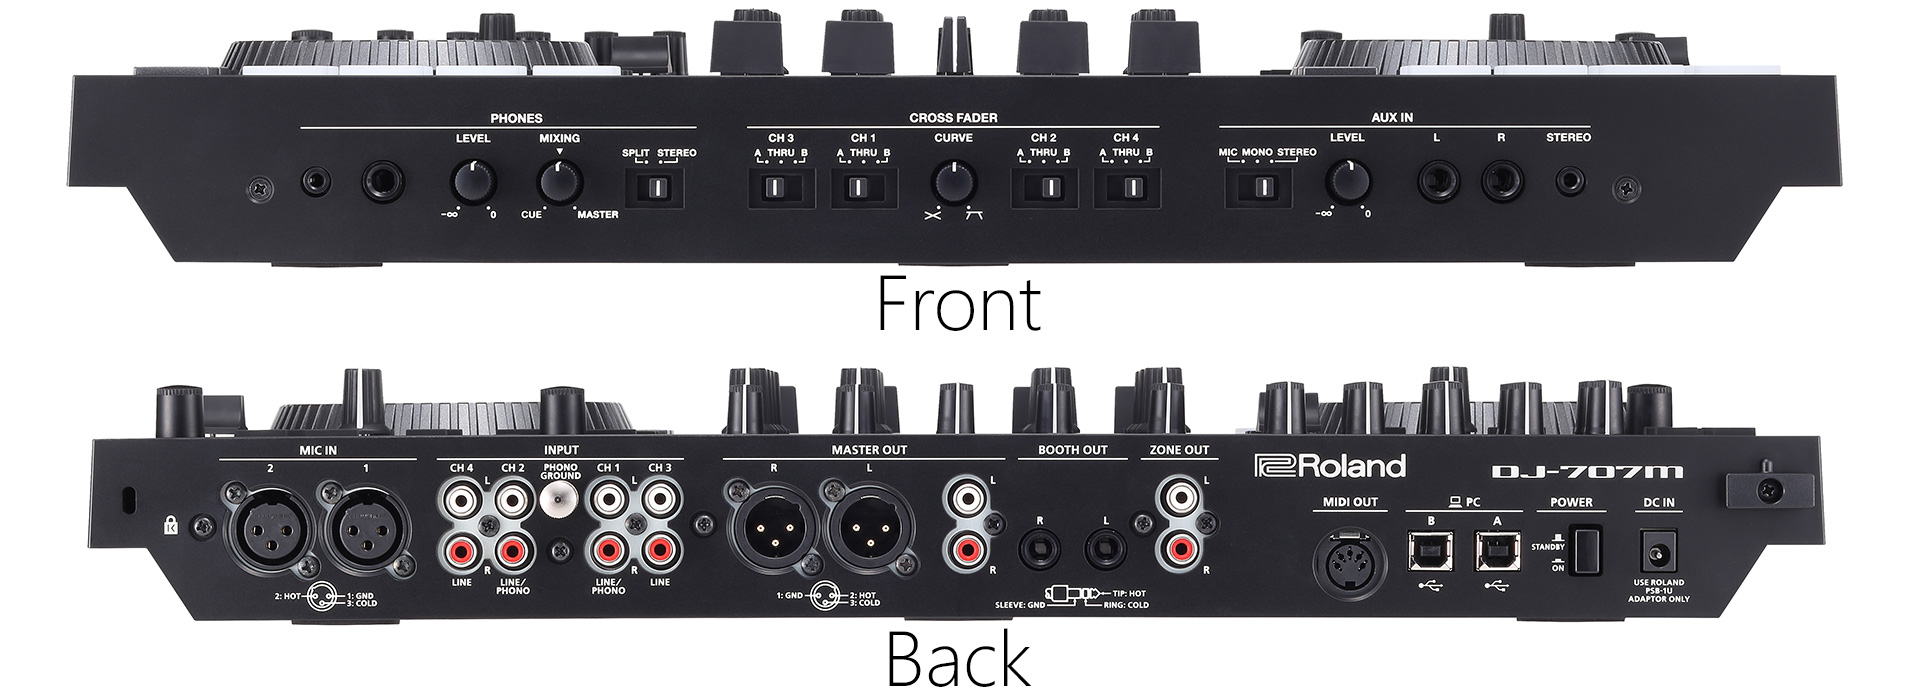 ROLAND DJ-707M Controller Dj Front - Rear